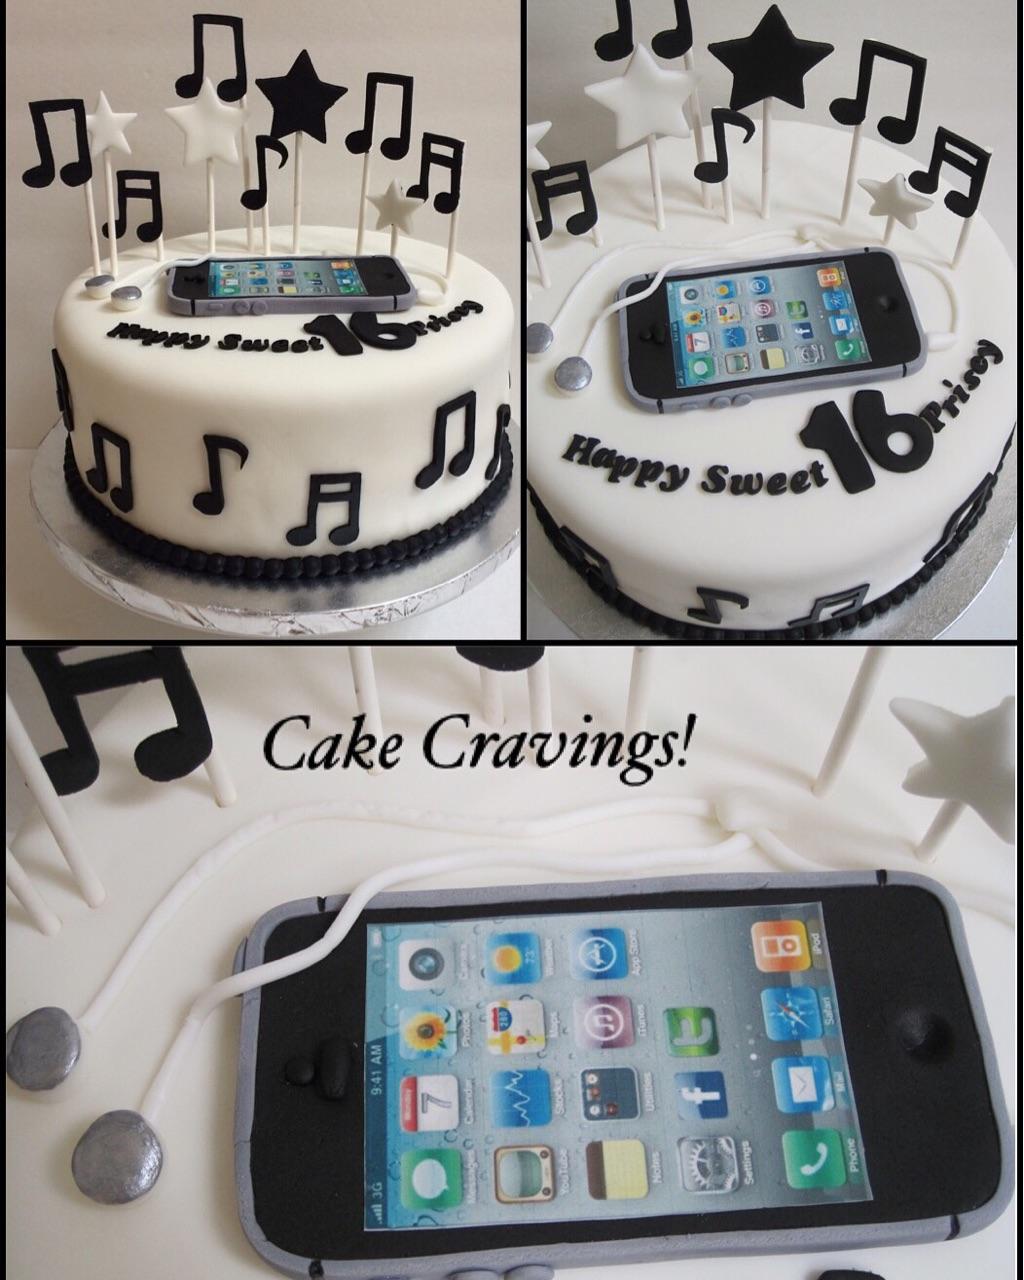 Iphone Cake Cakecravingsz